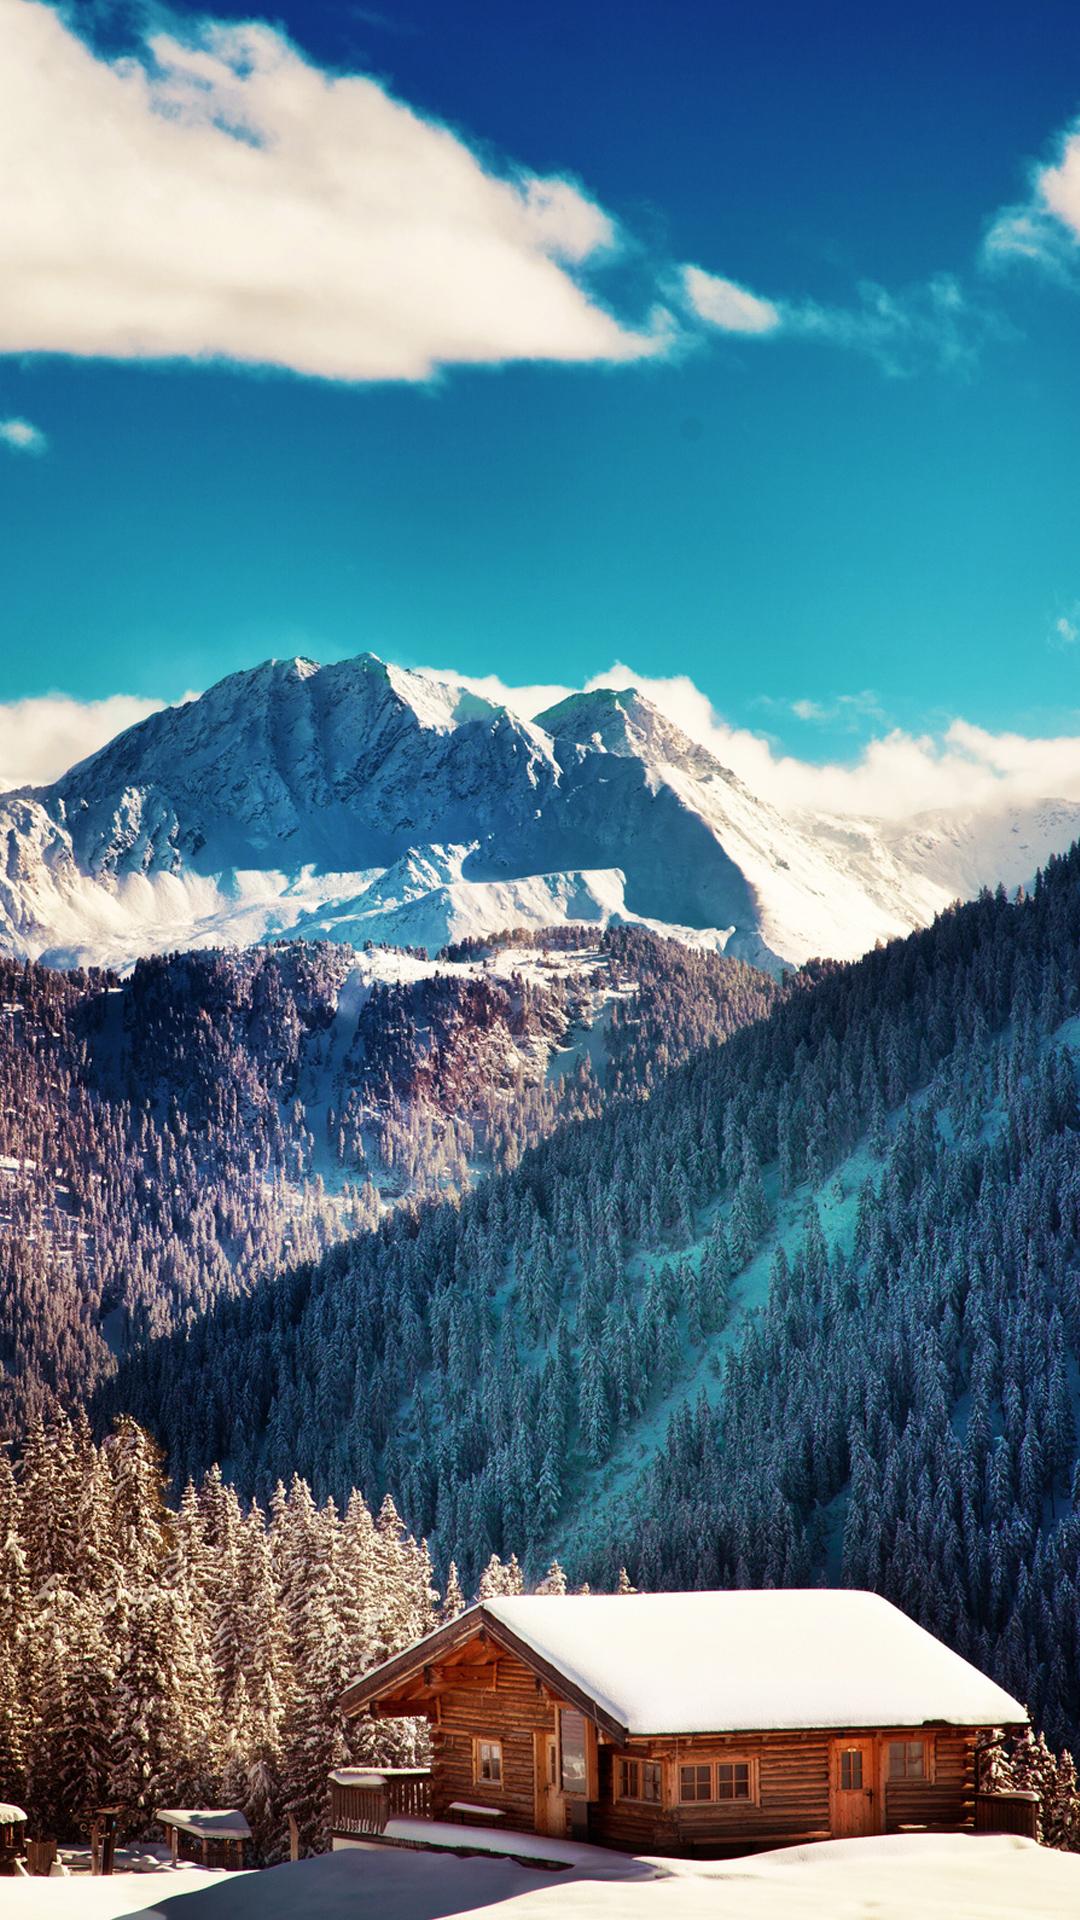 Mountains Chalet Winter Landscape iPhone 6 Plus HD Wallpaper